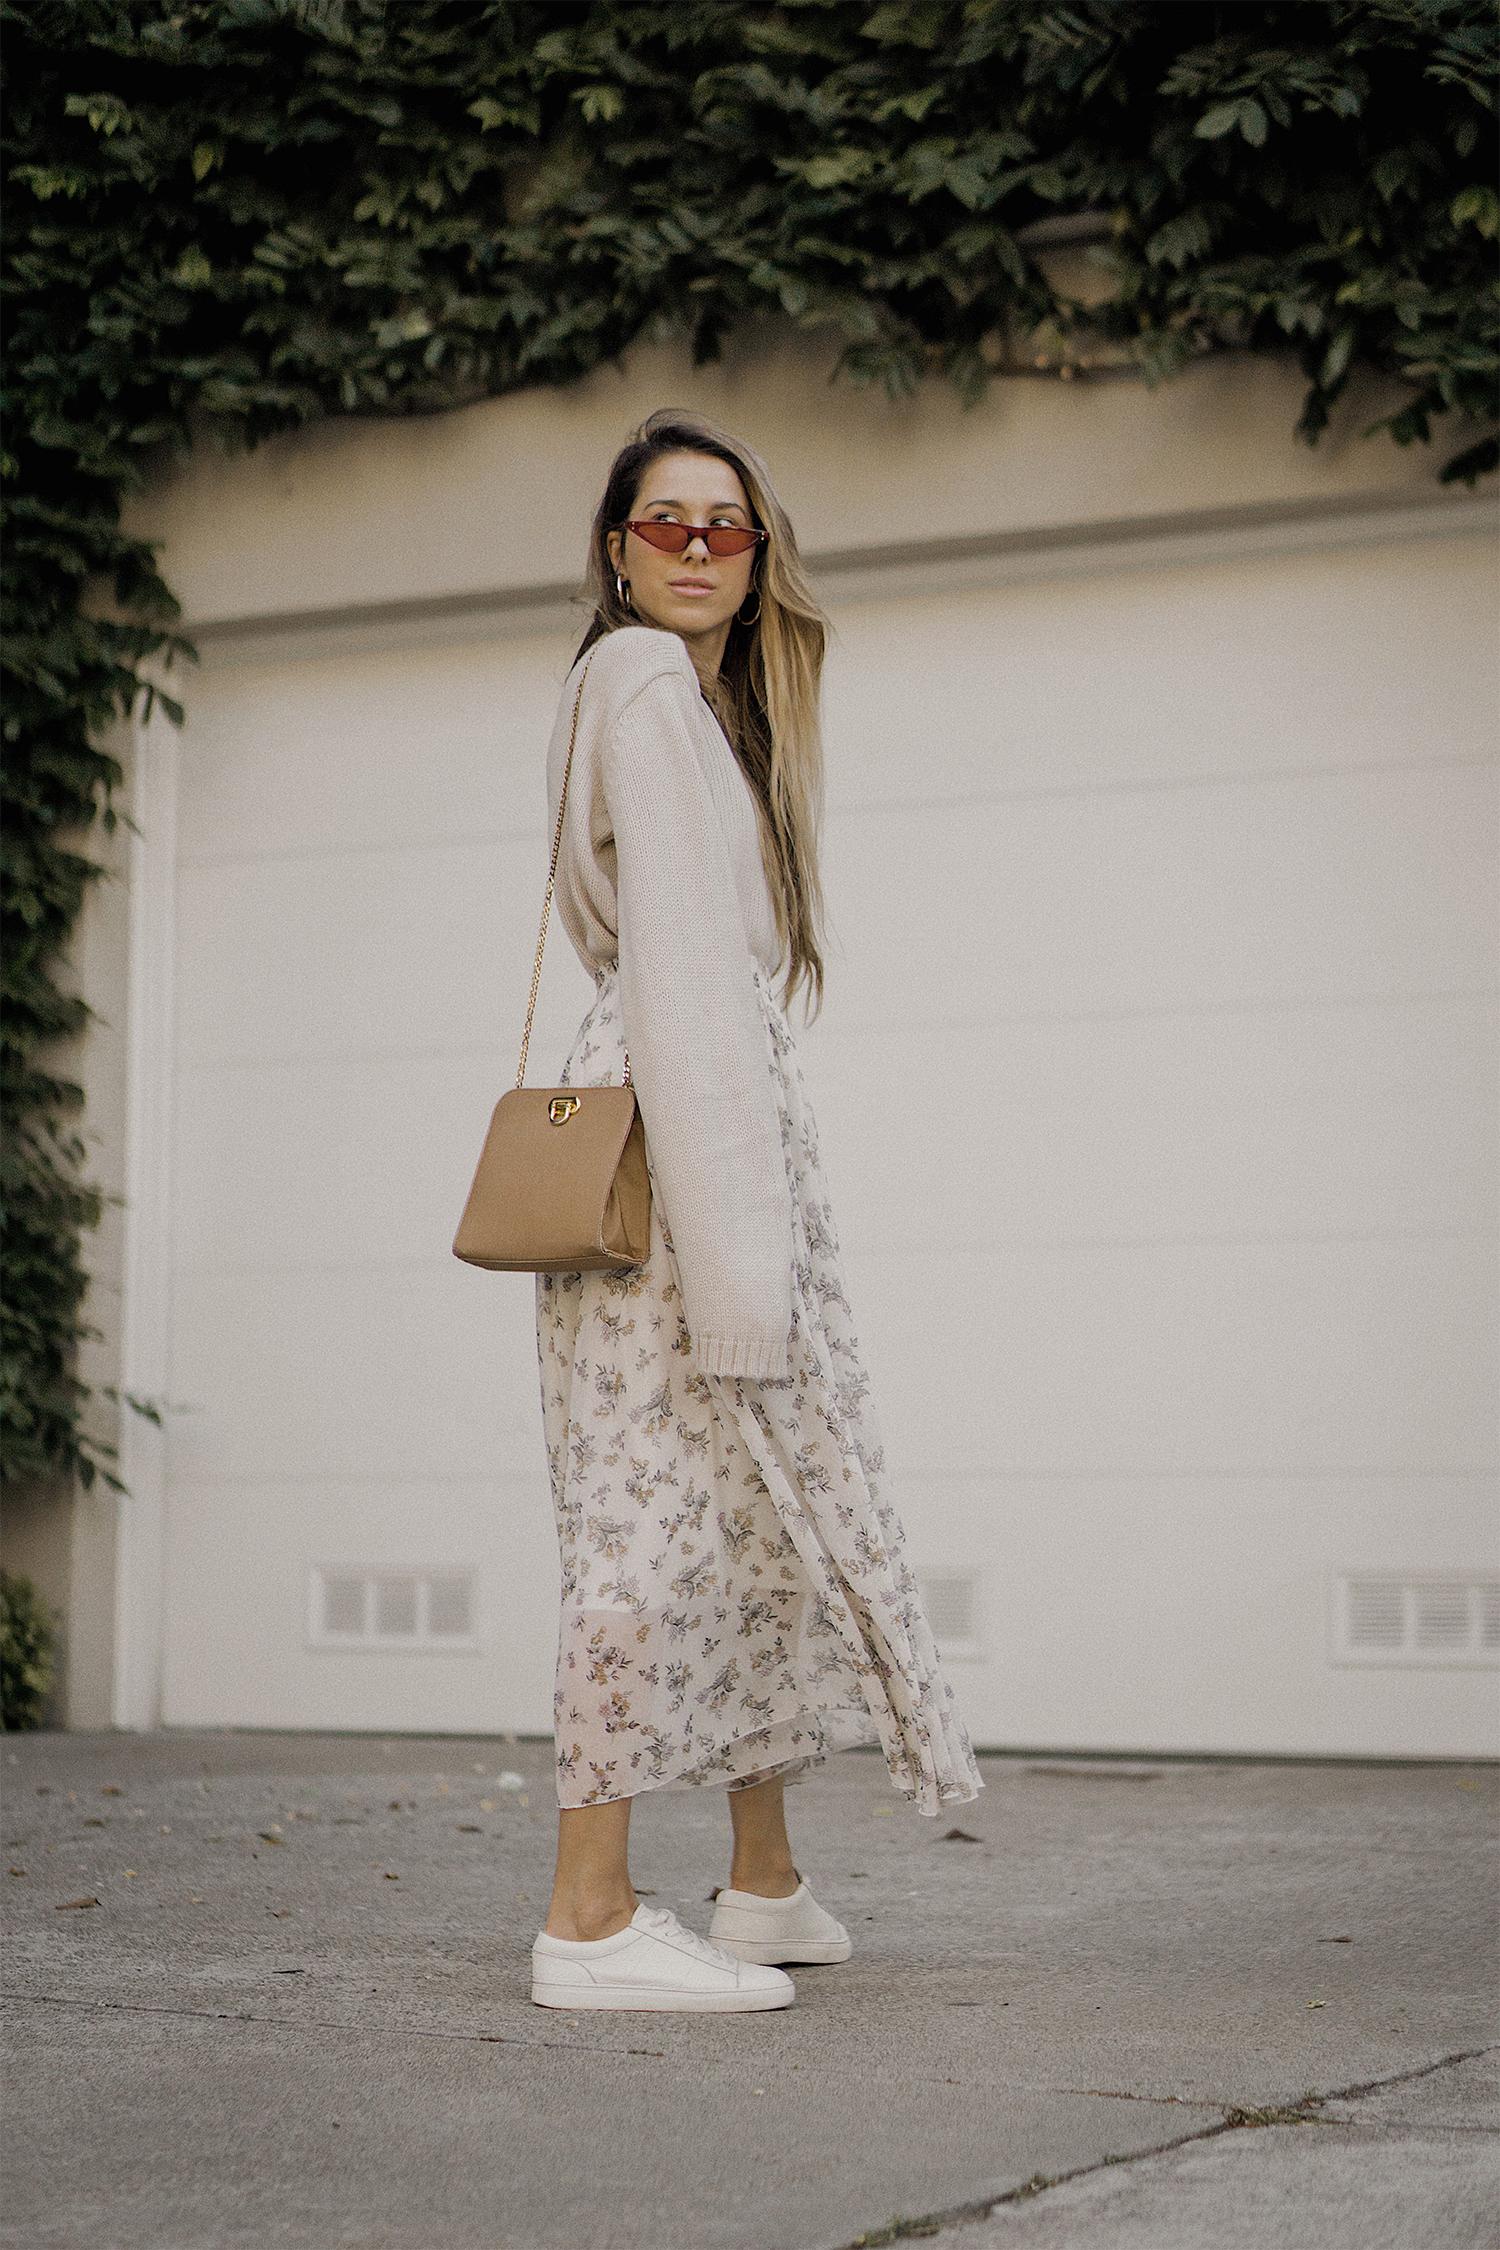 neutral_outfit_street_style_look_beige_tobi_sweater_long_skirt_romantic_beret_sneakers_vintage_lena_juice_the_white_ocean_04